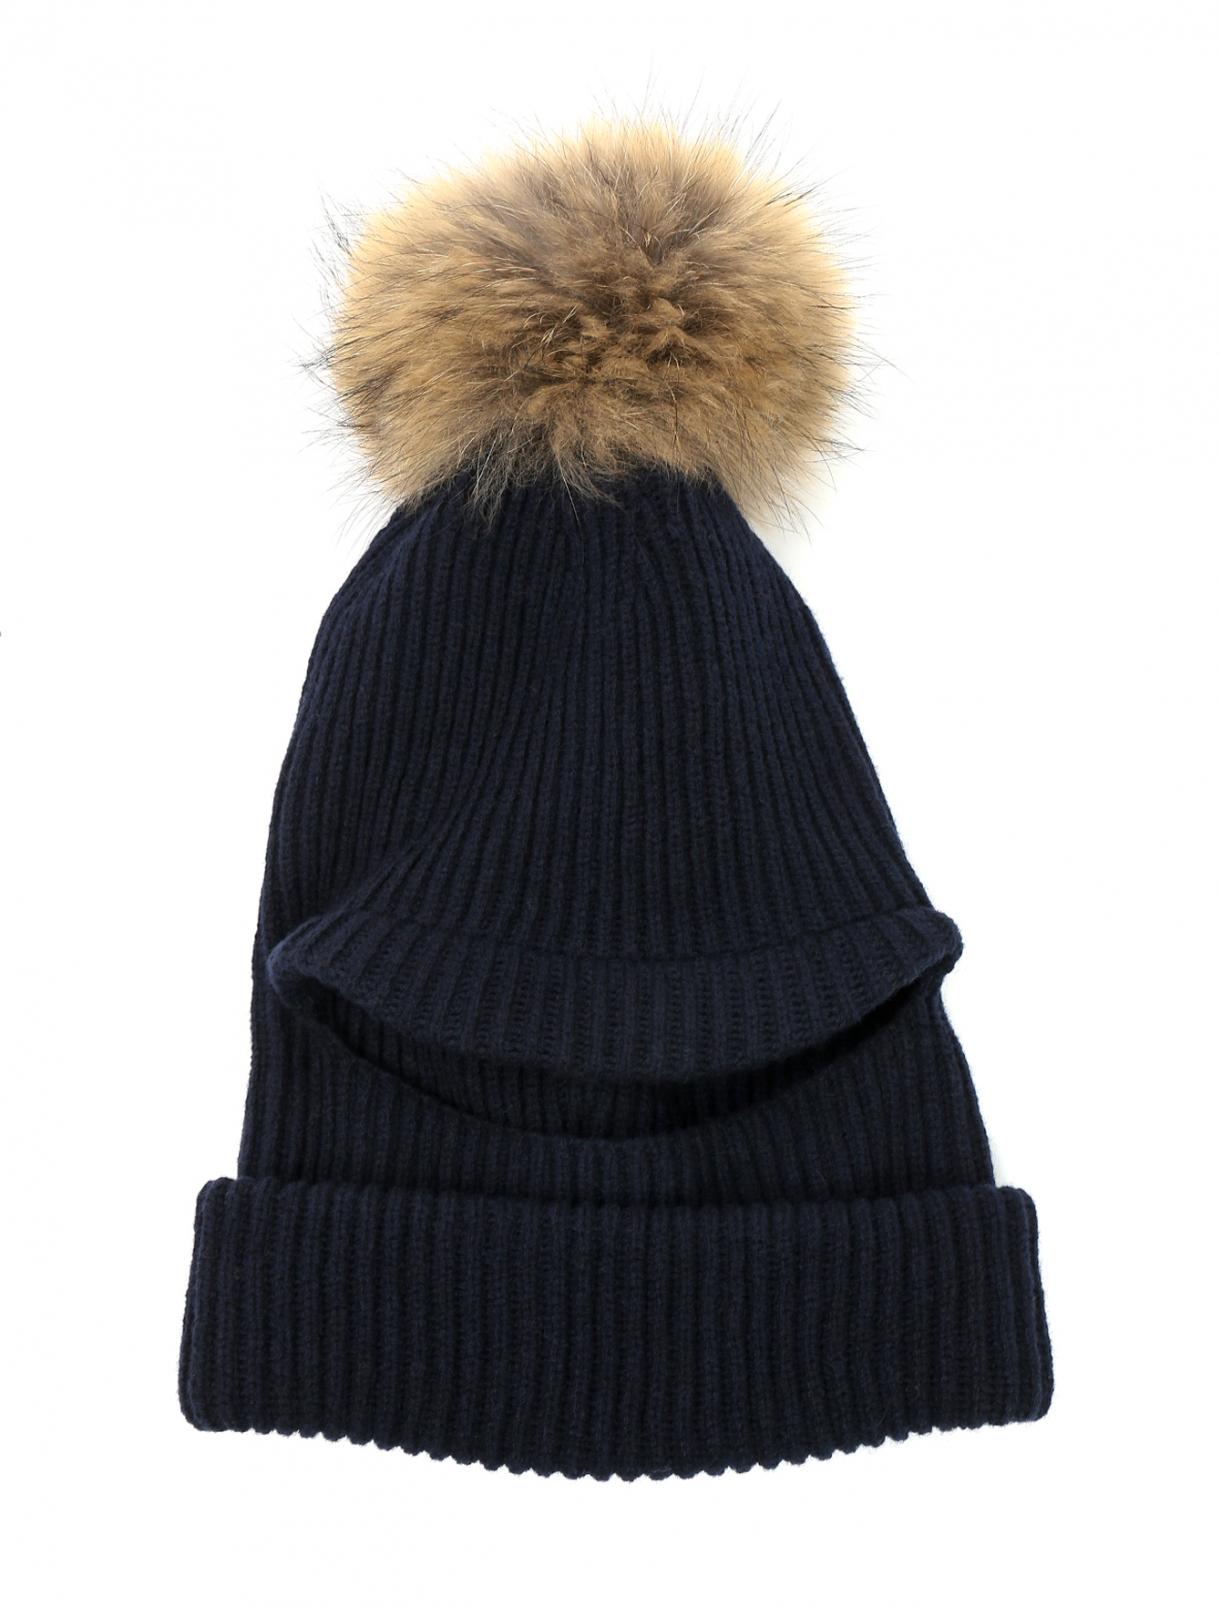 Шапка из шерсти Inverni  –  Общий вид